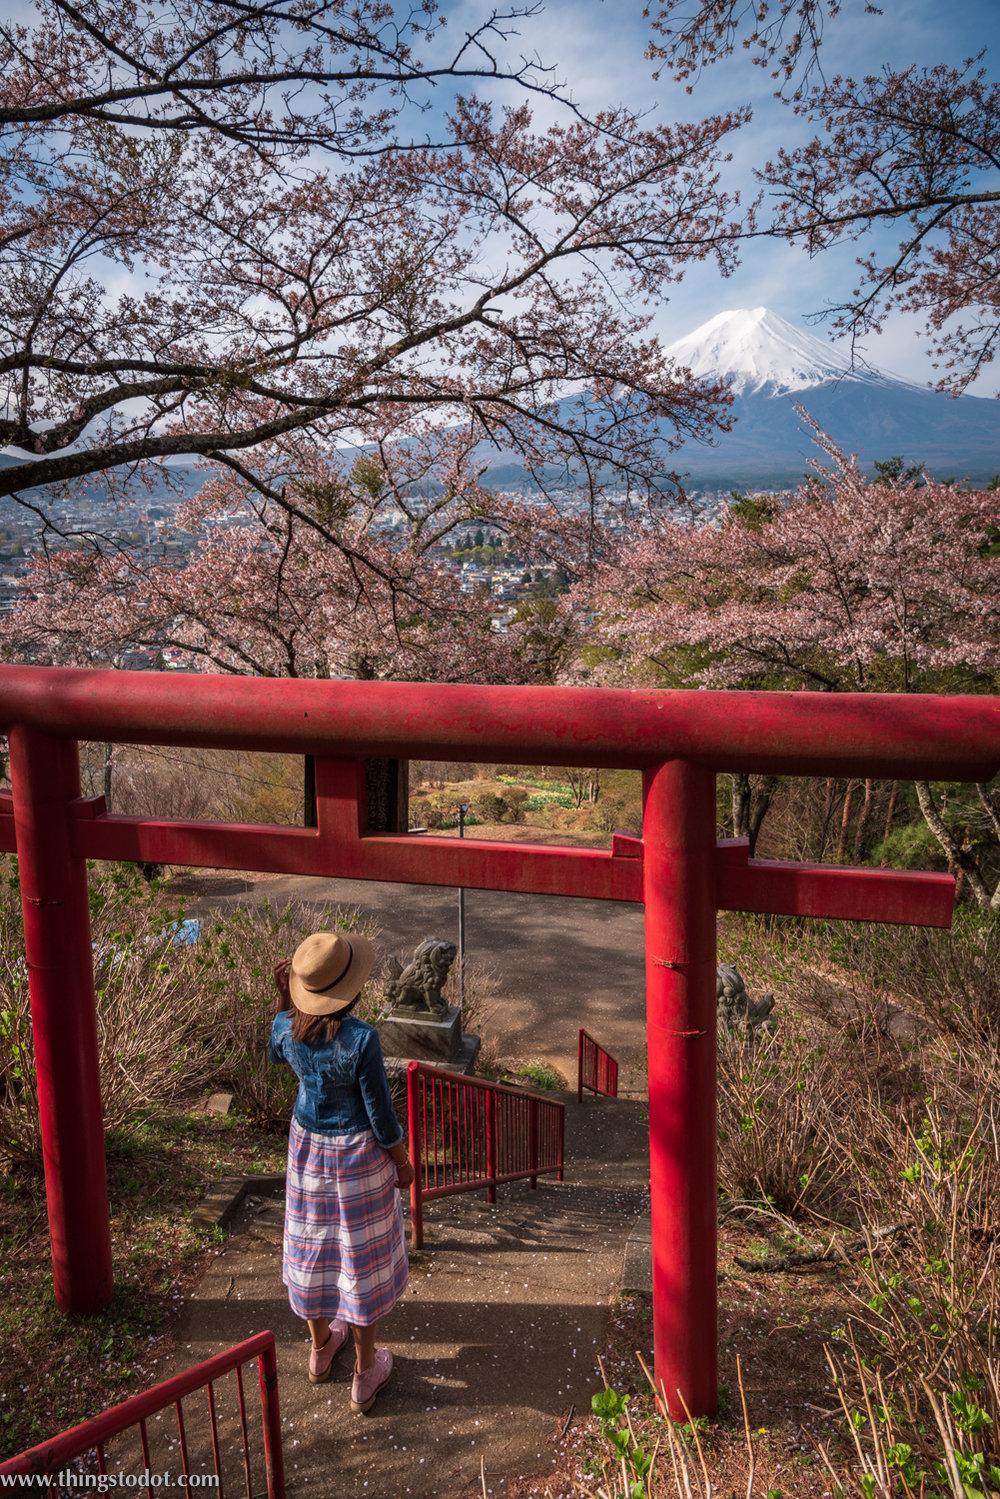 Cherry Blossoms, Sakura, Fuji, Japan.Image©www.thingstodot.com.